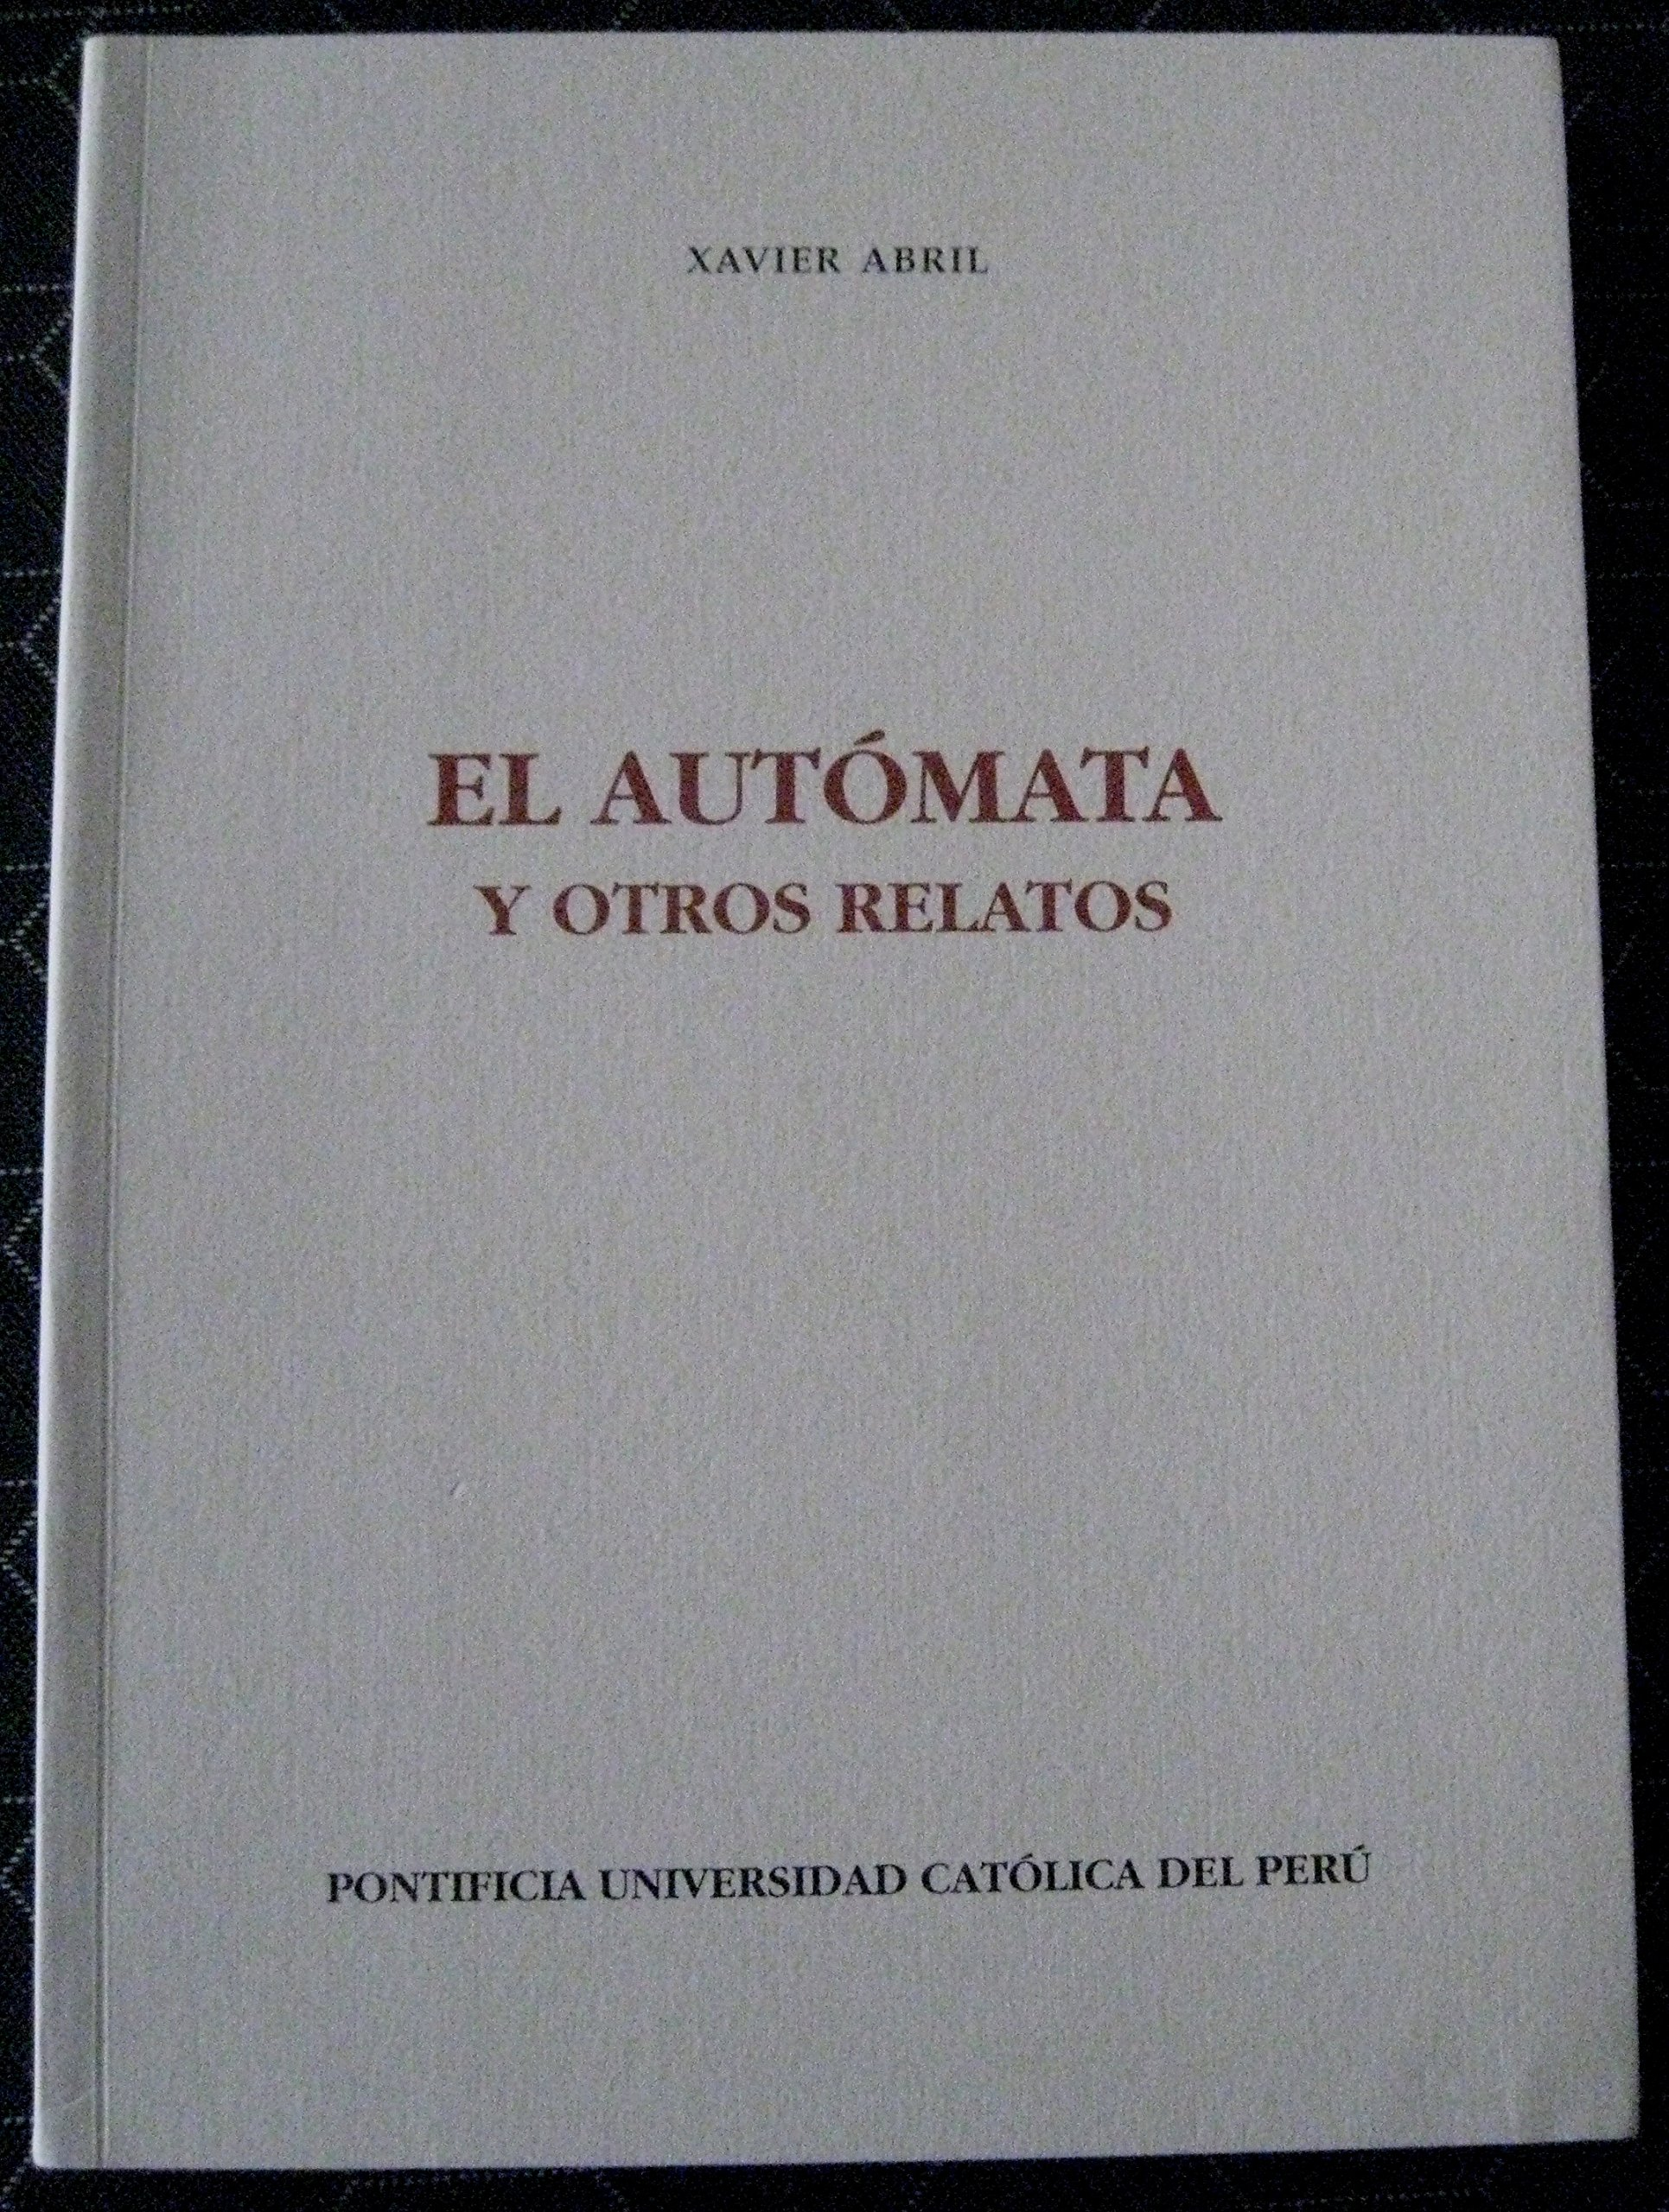 El Autómata y otros relatos: Abril, Xavier: 9789972659539: Amazon.com: Books